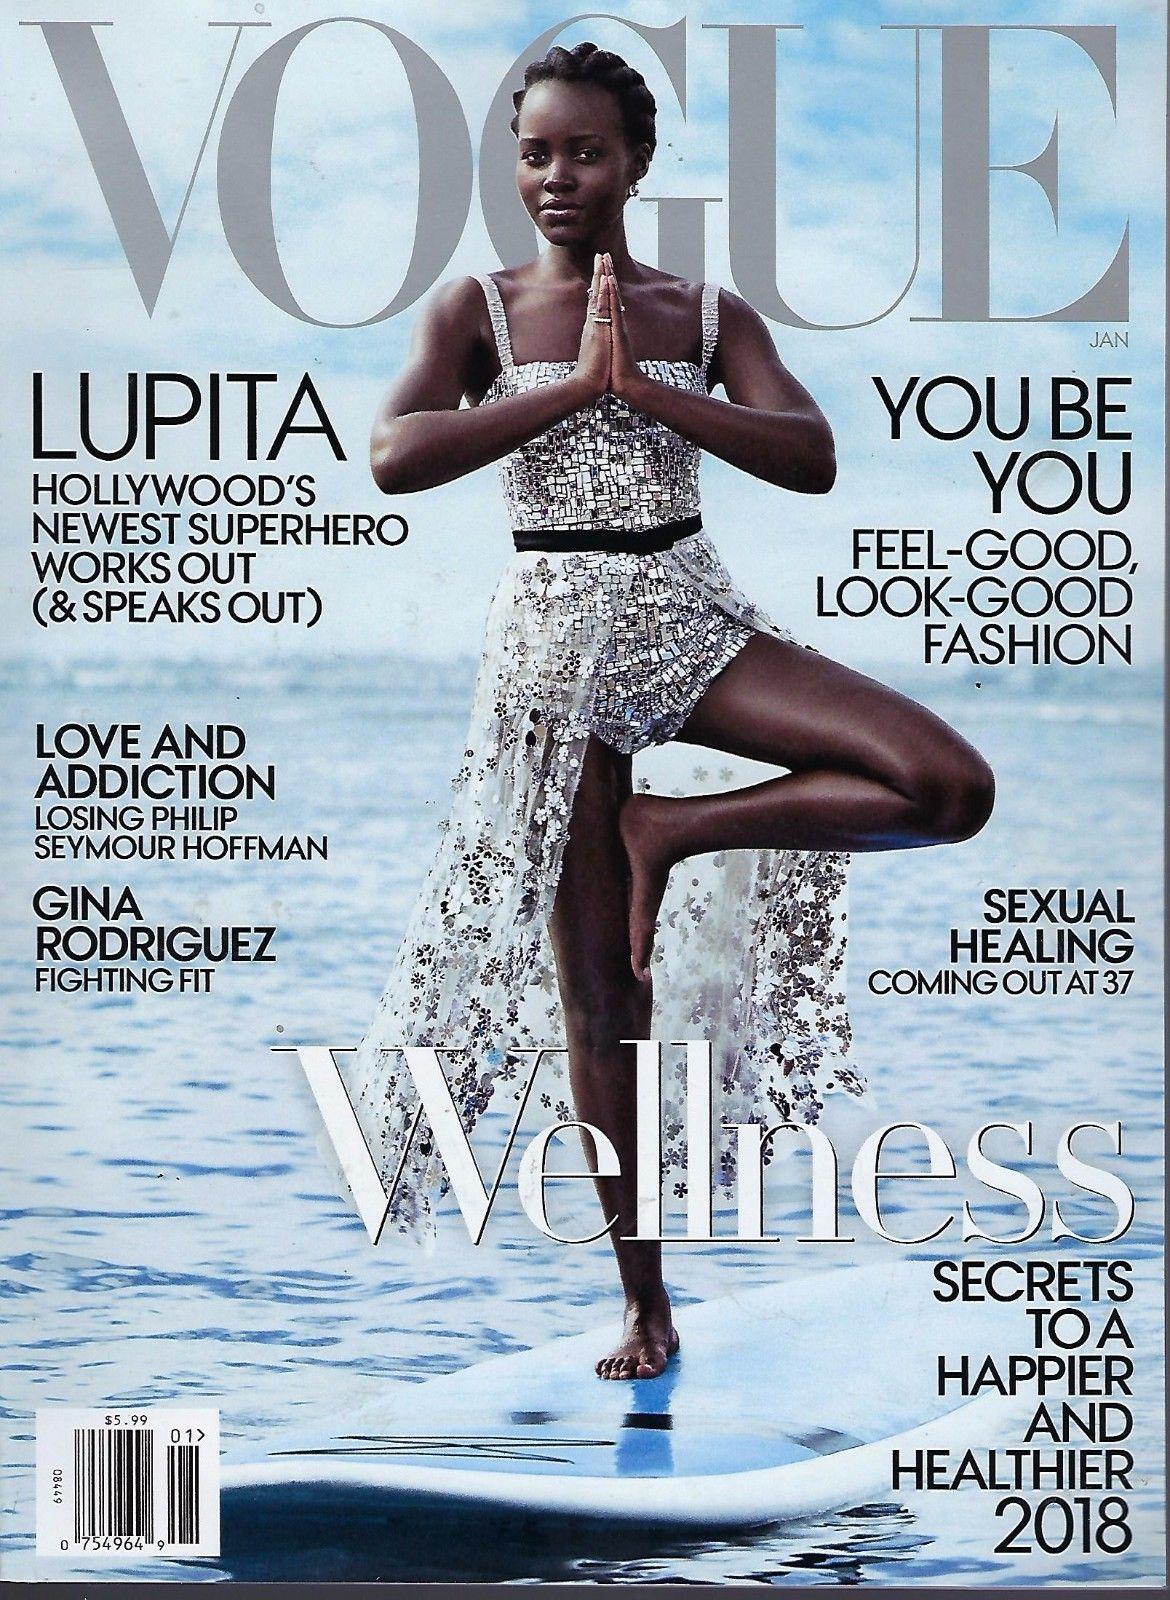 1026338c17b8 Lupita Nyong o is Vogue US  January 2018 Cover Girl!